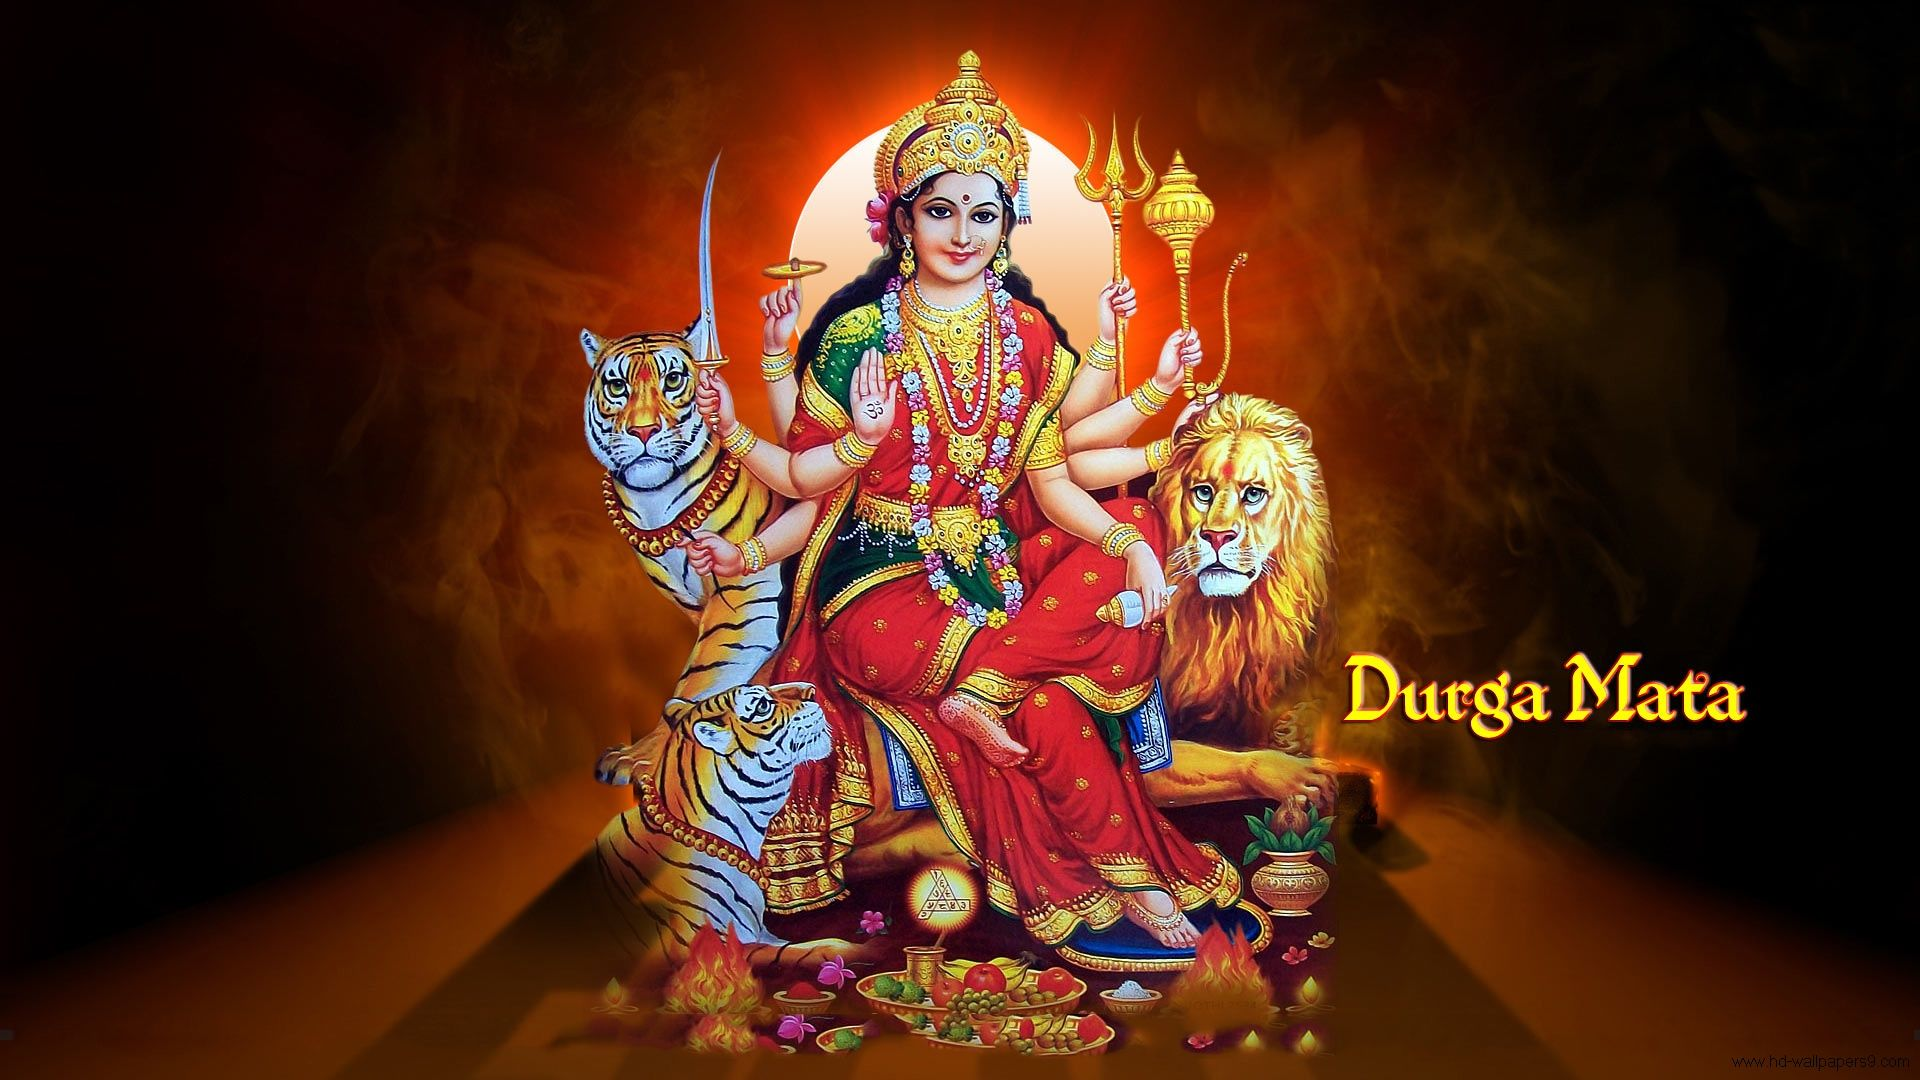 Hindu Gog Durga Matha Images001 Jpg 1920 1080 Maa Durga Hd Wallpaper Hd Wallpapers 1080p Durga